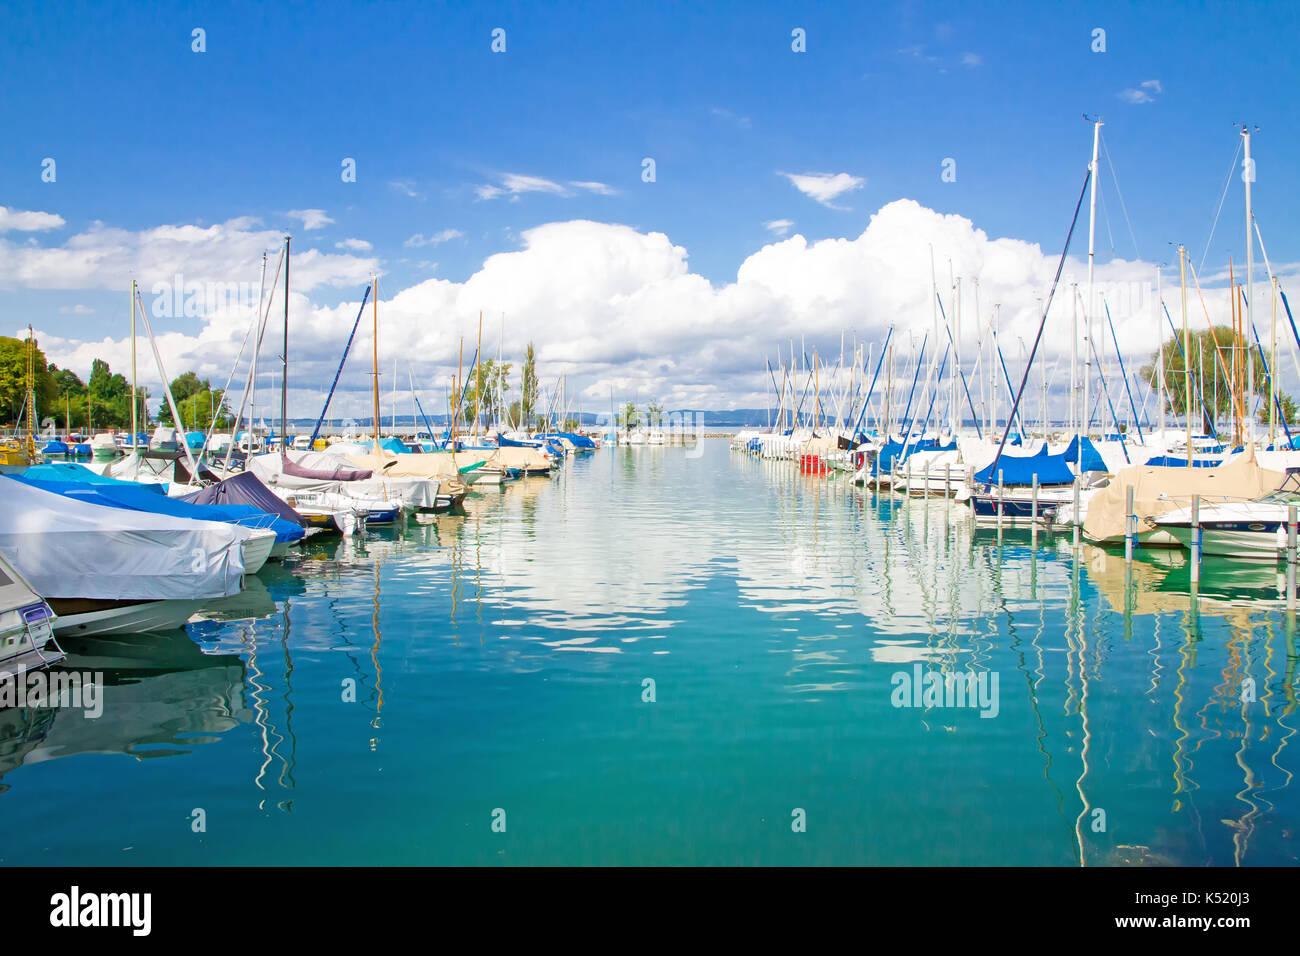 Lake Constance, Bodensee Romanshorn - Switzerland - Stock Image